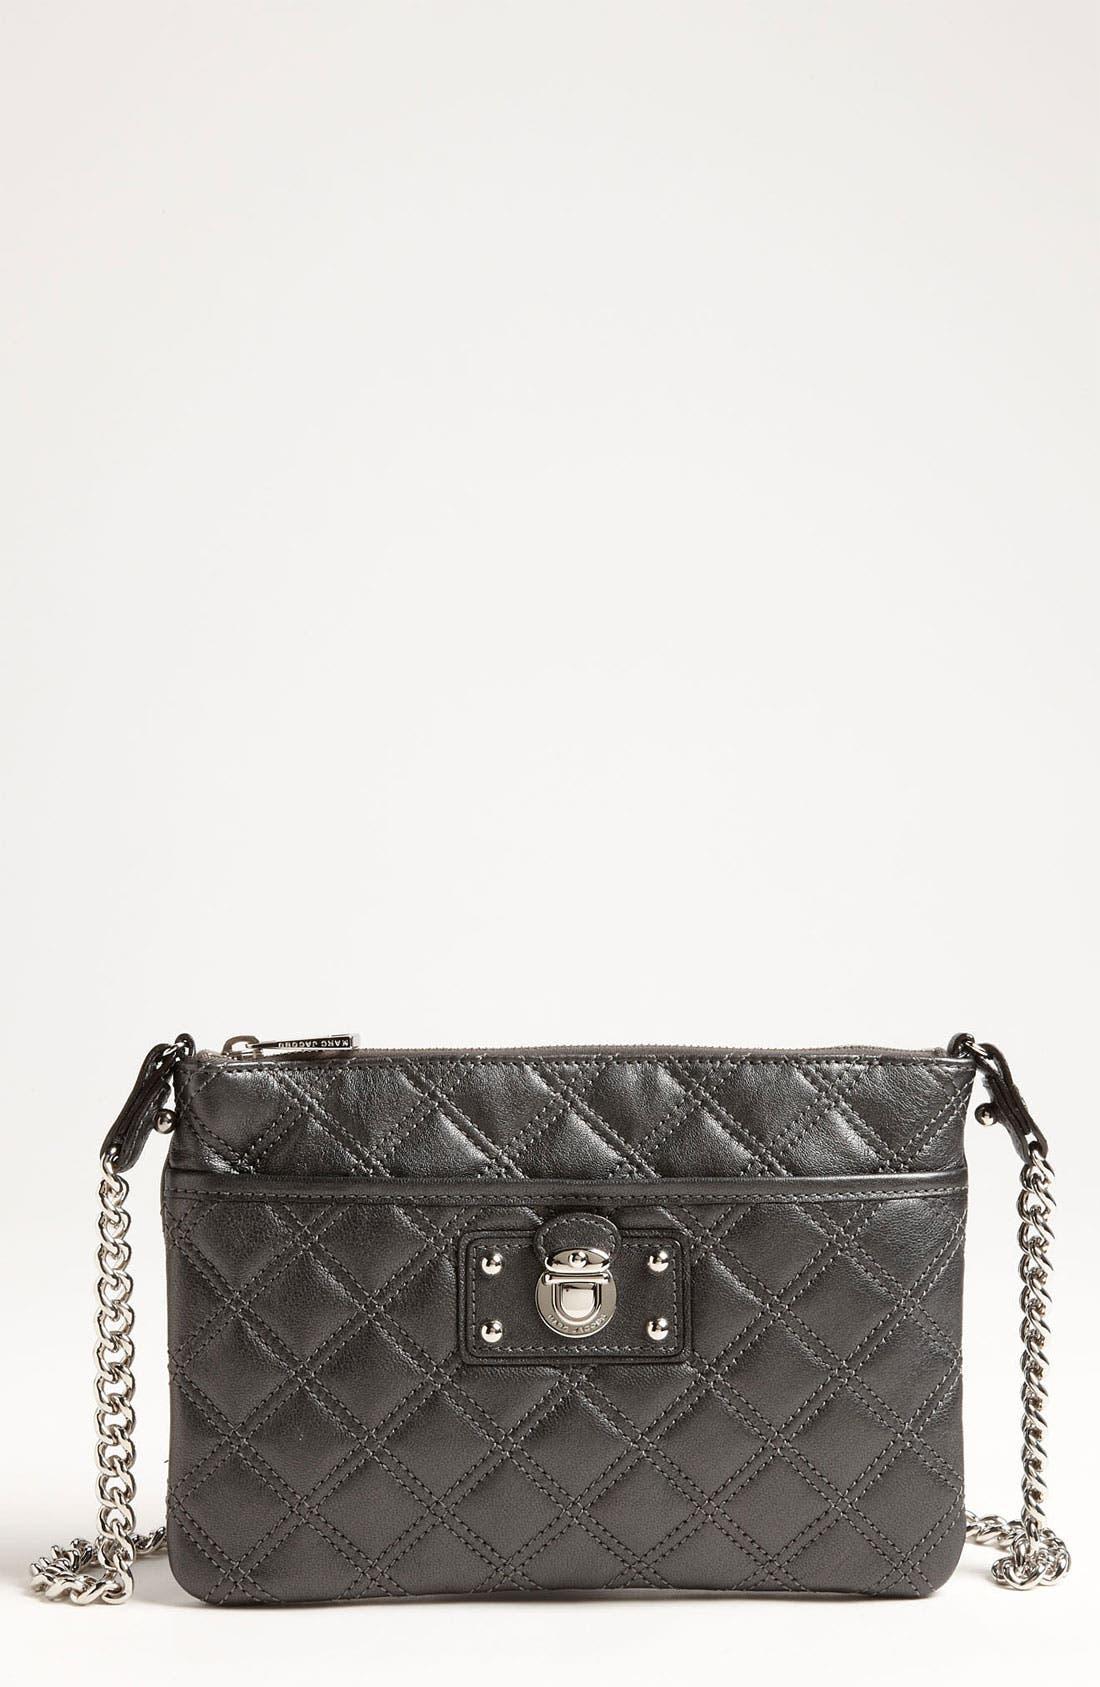 Main Image - MARC JACOBS 'Murray' Leather Crossbody Bag